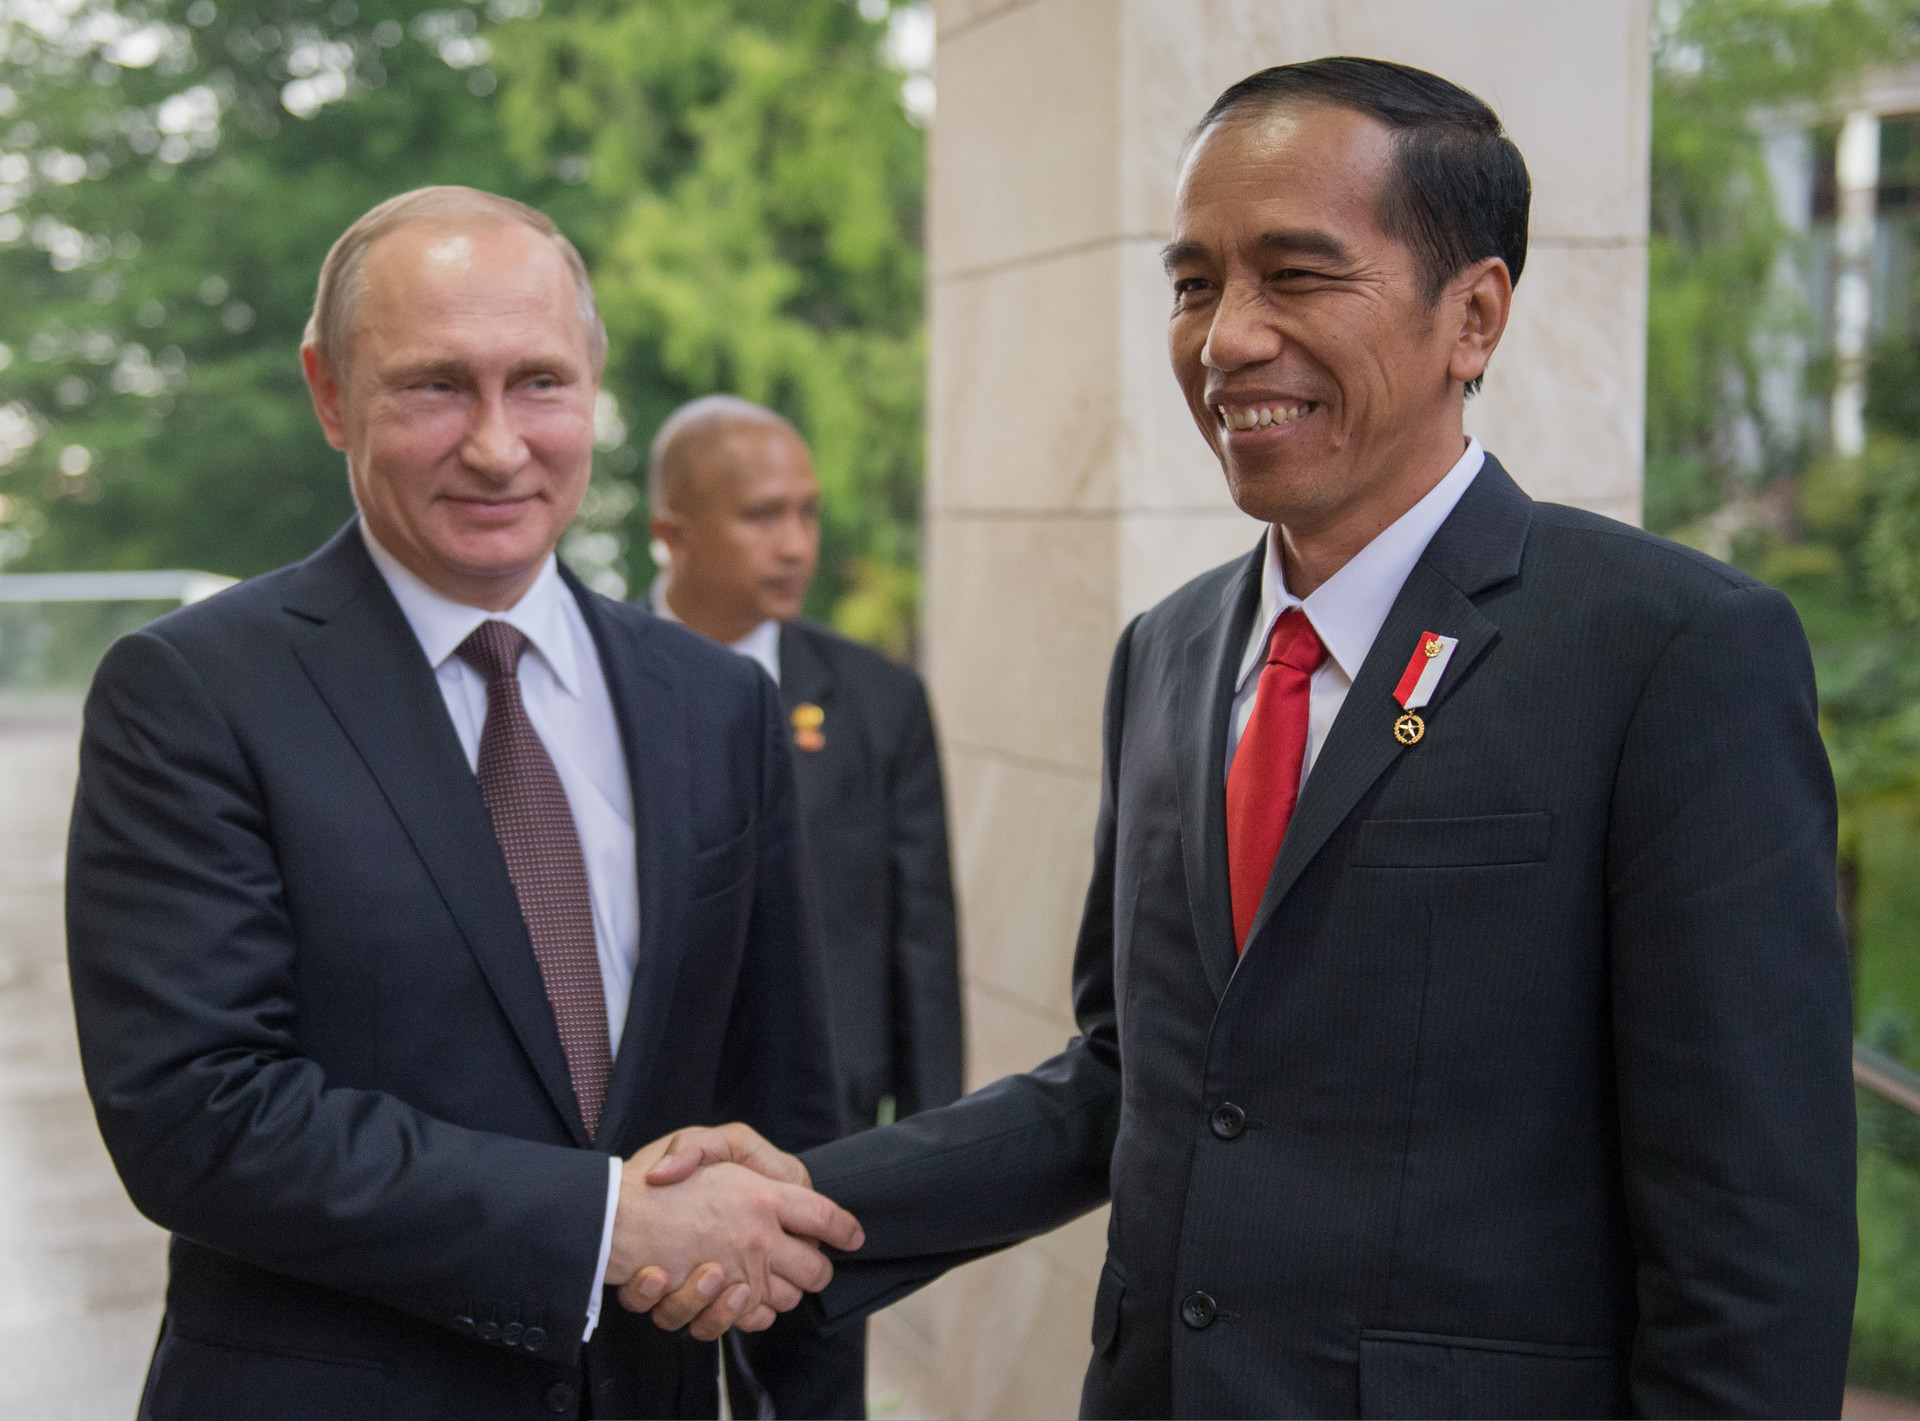 Presiden Rusia Vladimir Putin menyambut Presiden Indonesia Joko Widodo di keresidenan Bocharov Ruchei, di Sochi, 18 Mei 2016.